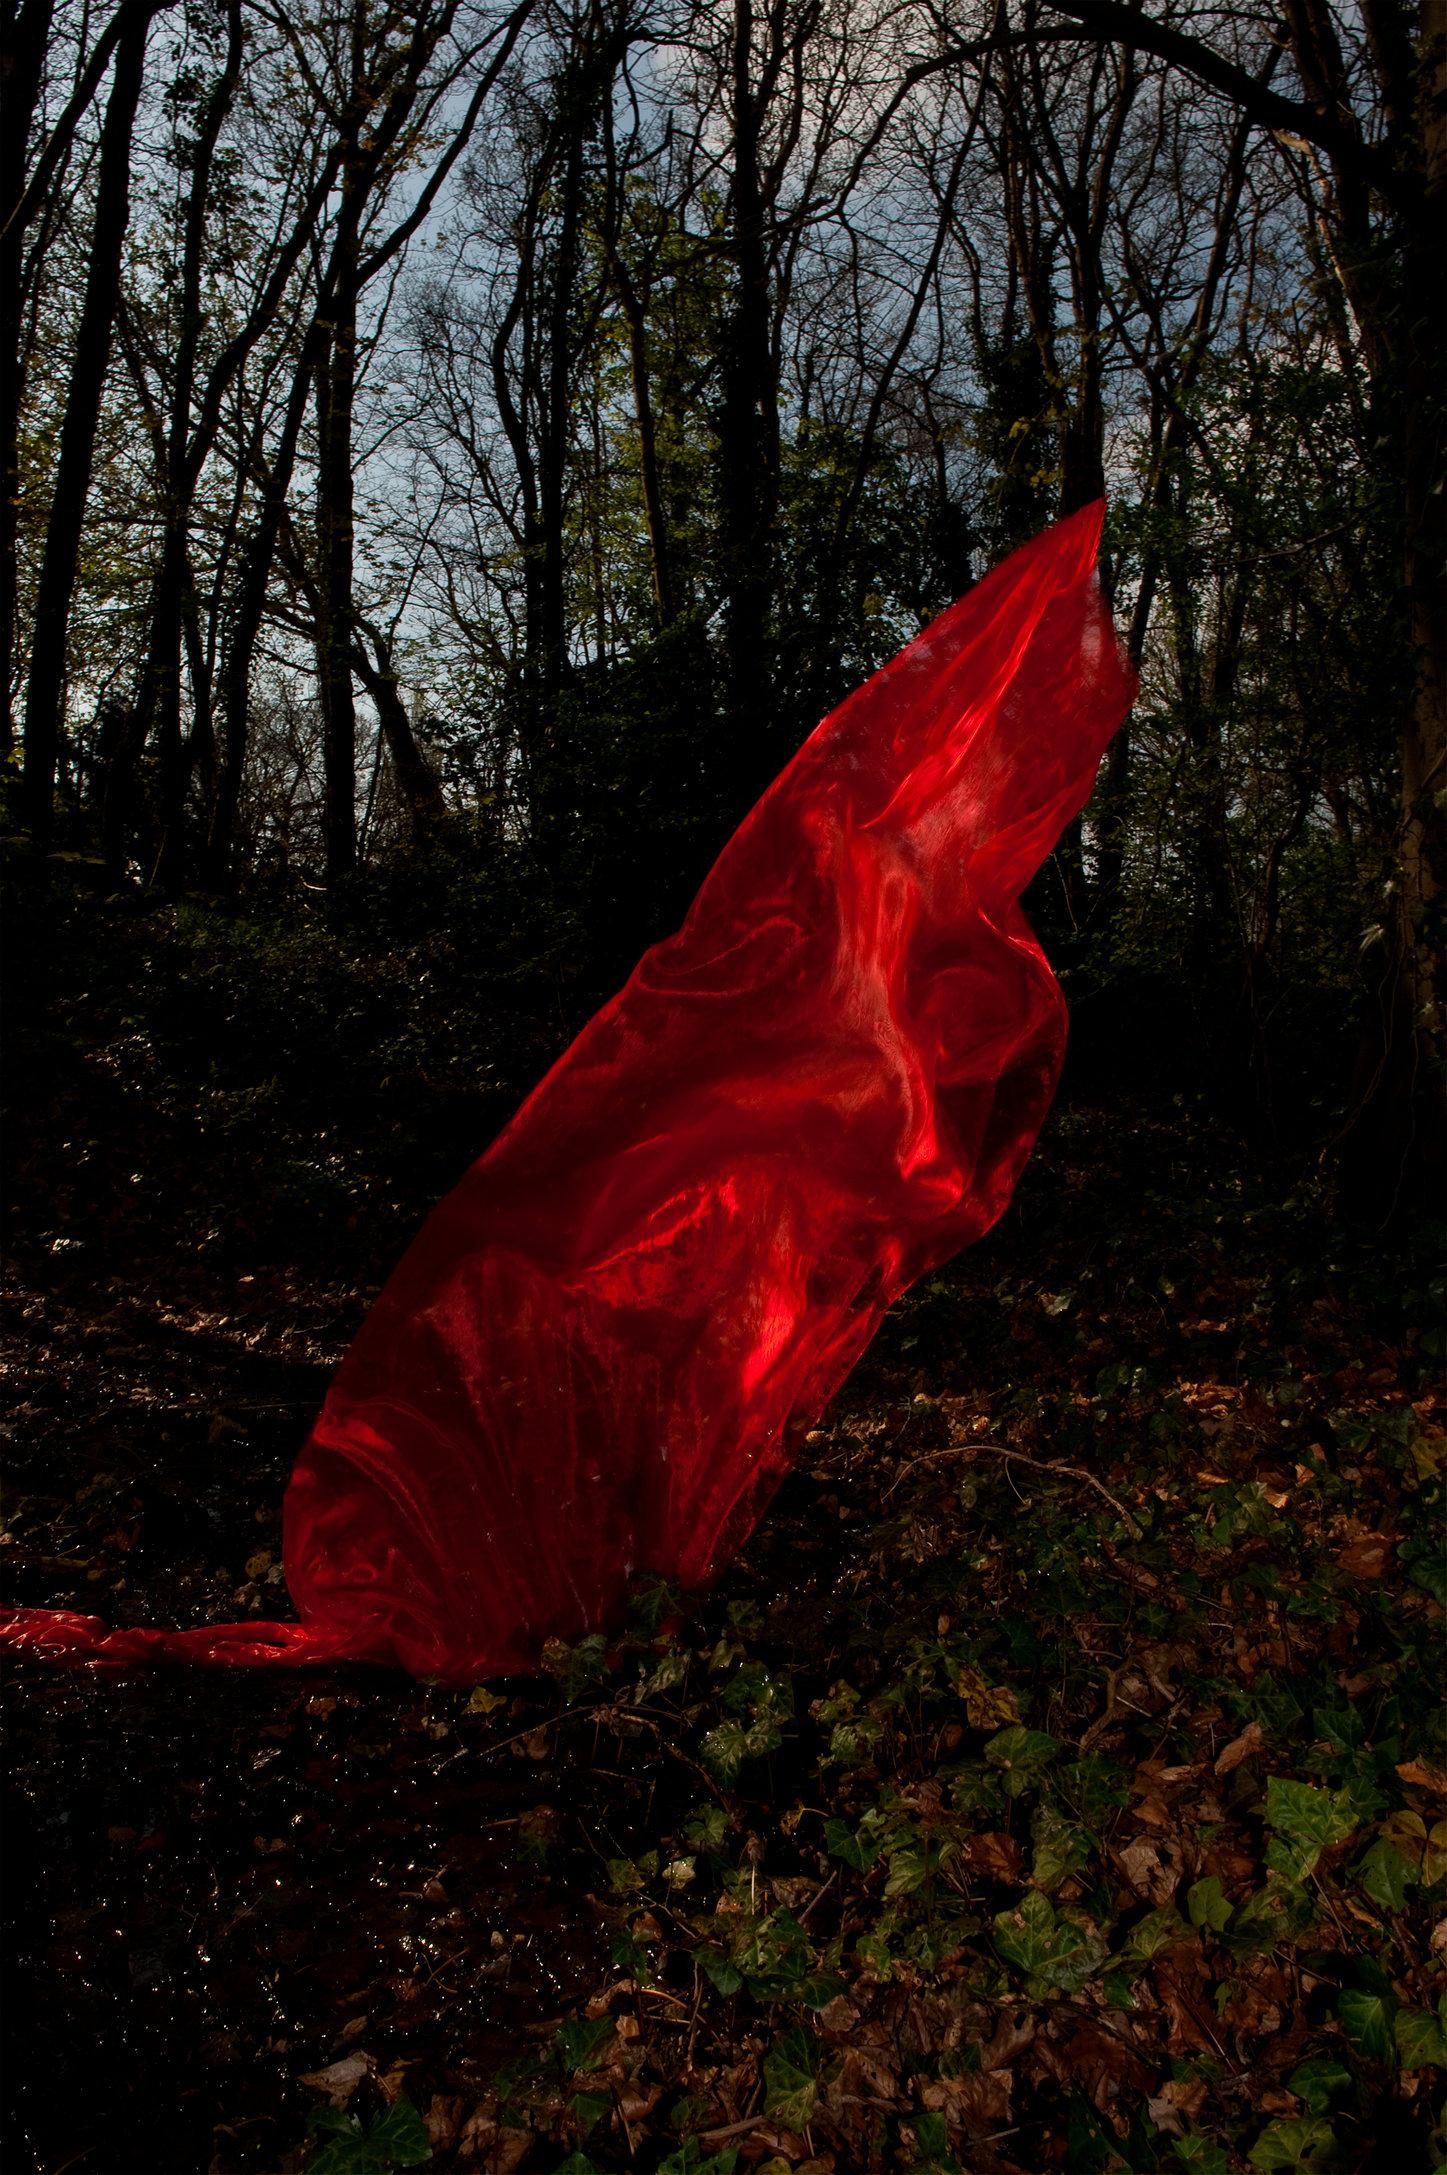 Cinderella-_1-1_MvanLaake_A203_2012.jpg